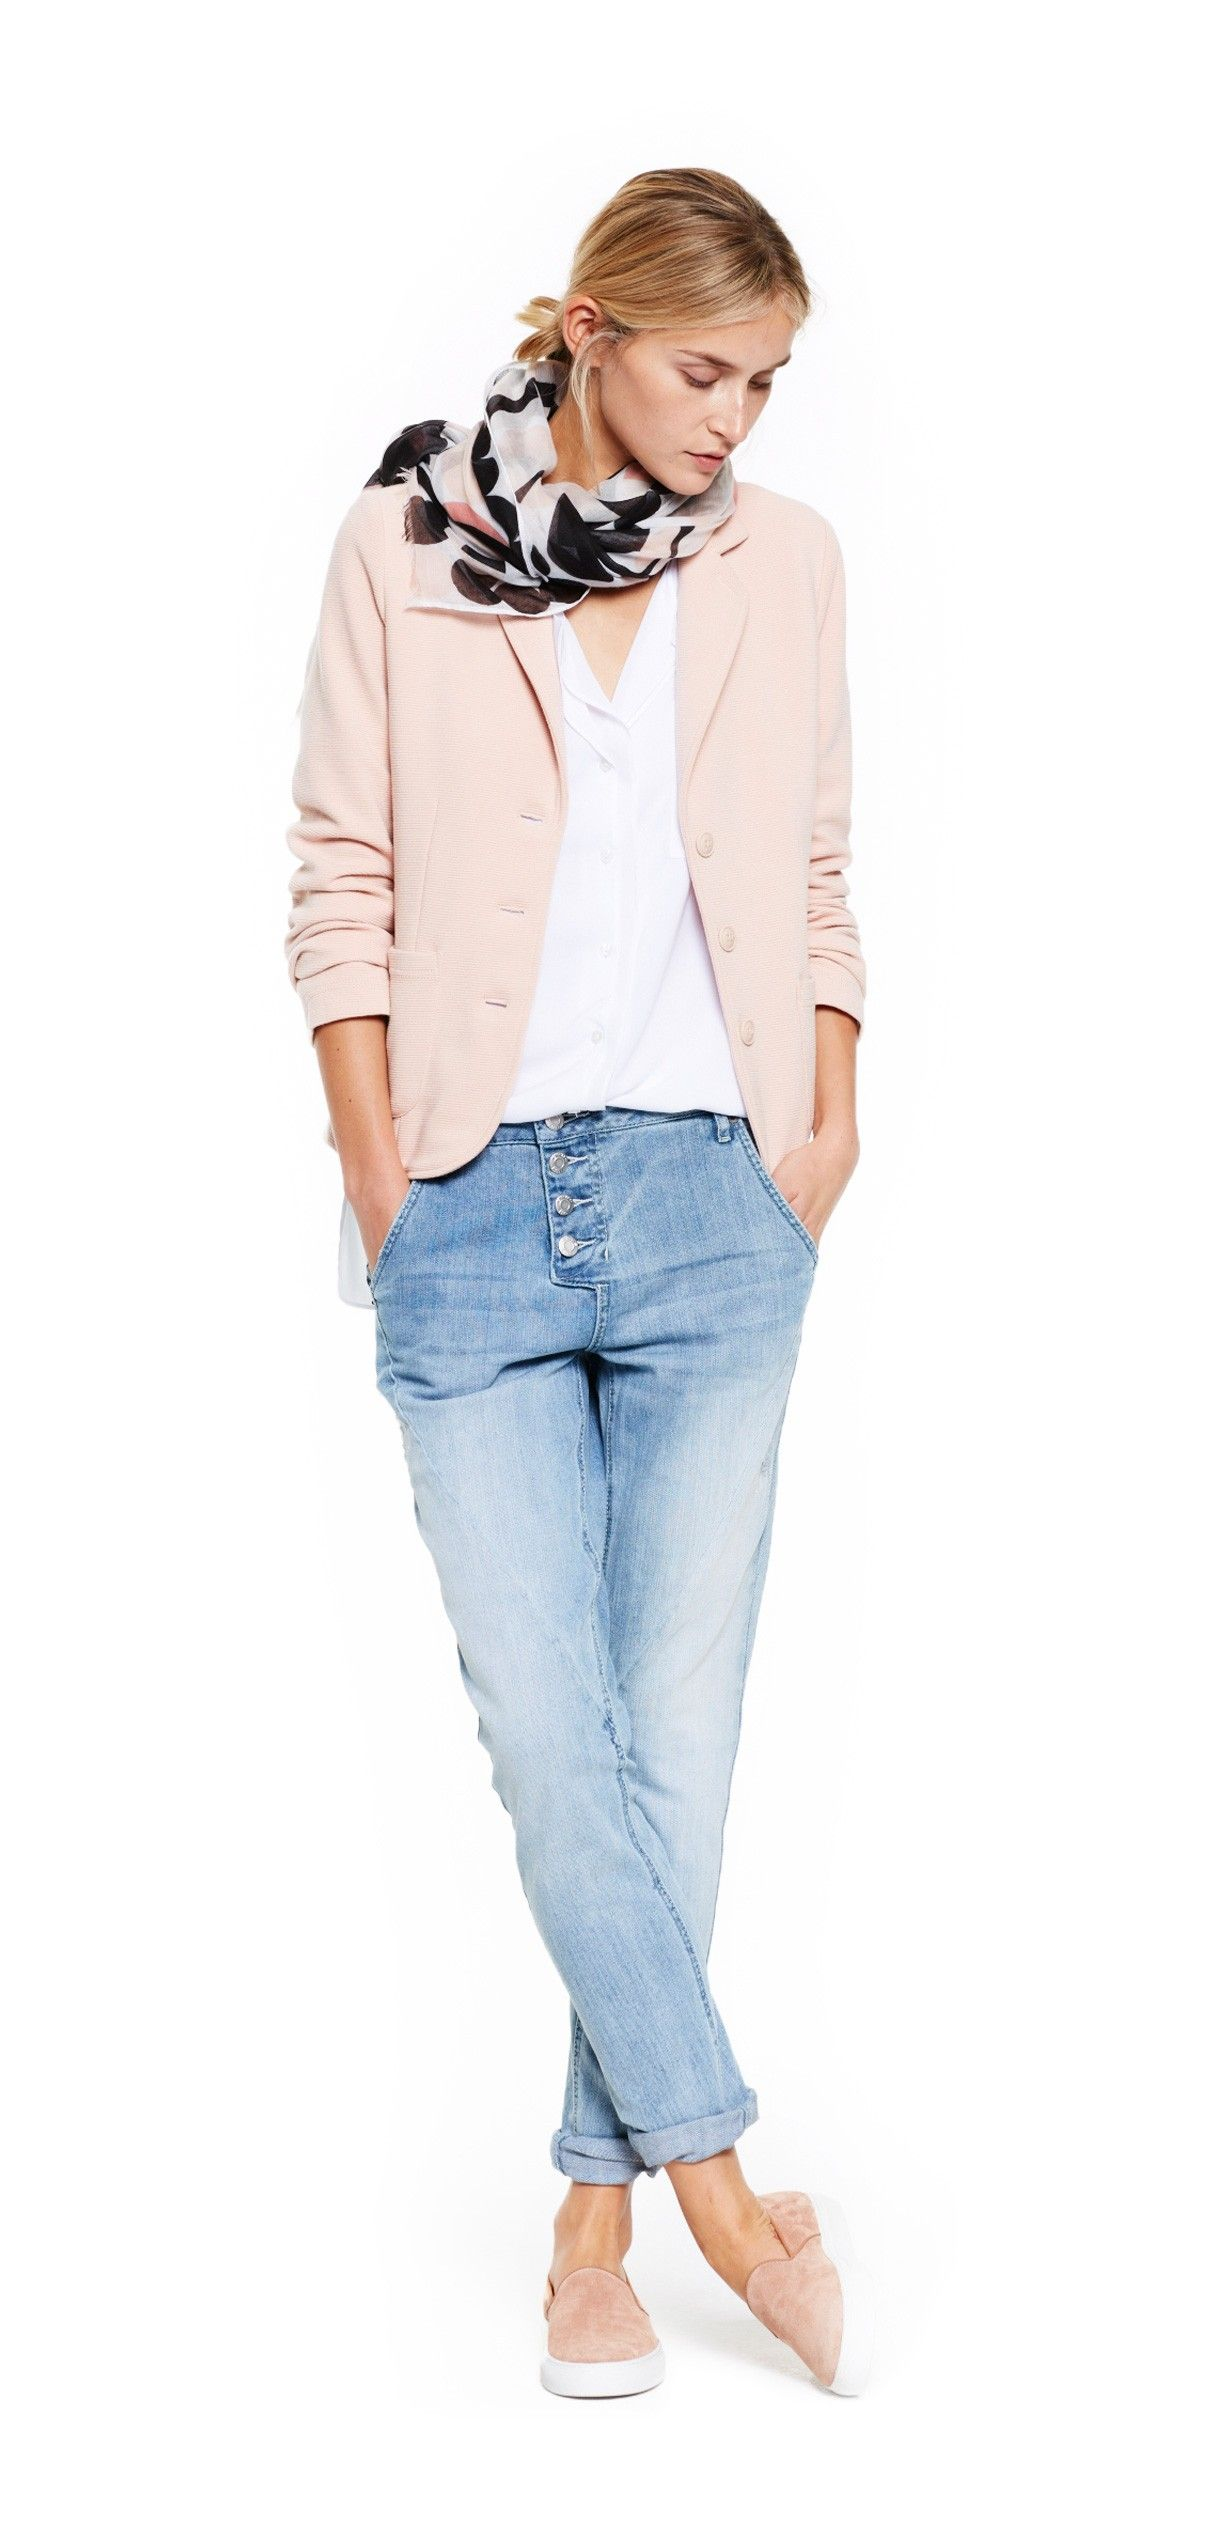 outfits shoppen online